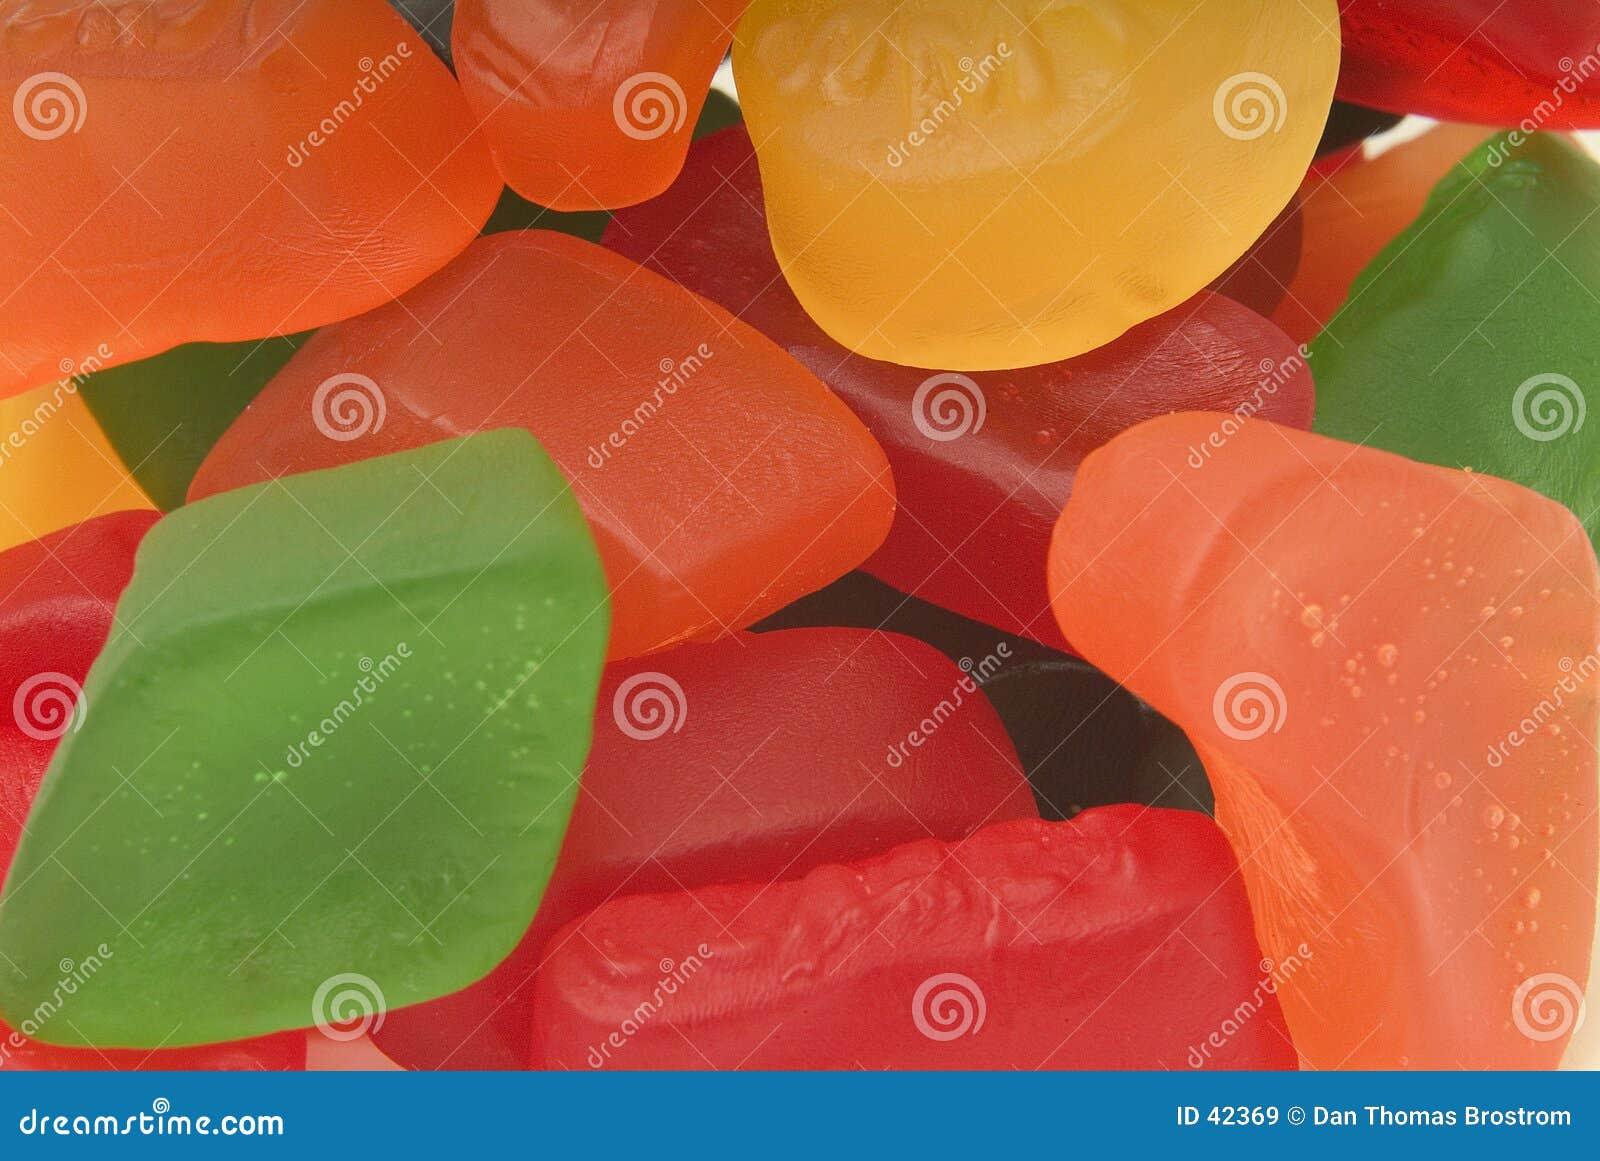 Download Caramelo imagen de archivo. Imagen de azúcar, goma, dulce - 42369